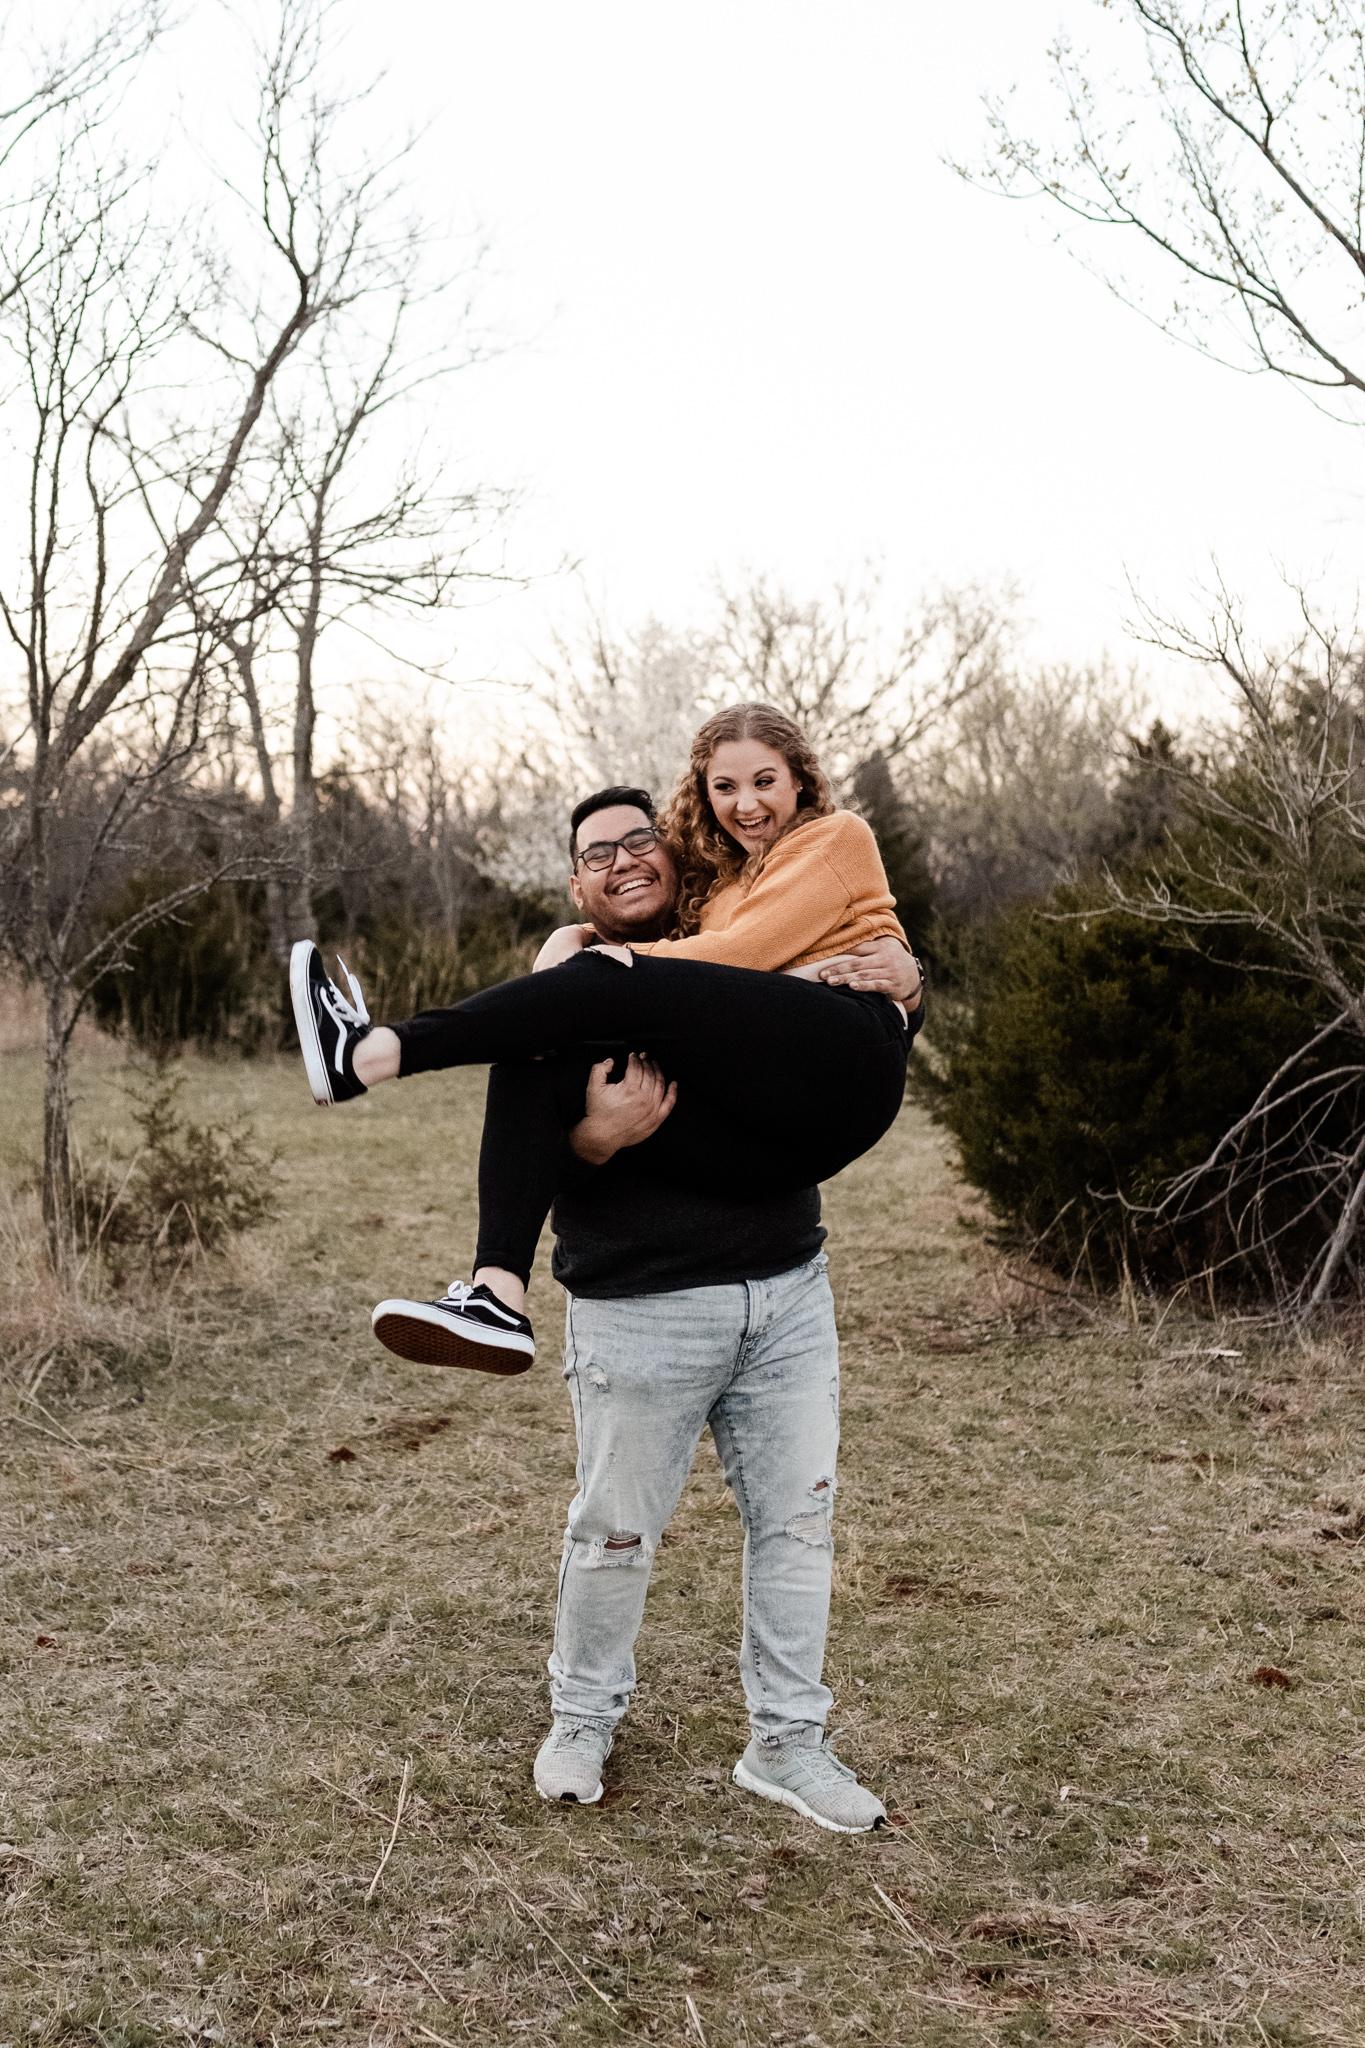 Galindo Engagements-Oklahoma Wedding Photographer-35.jpg